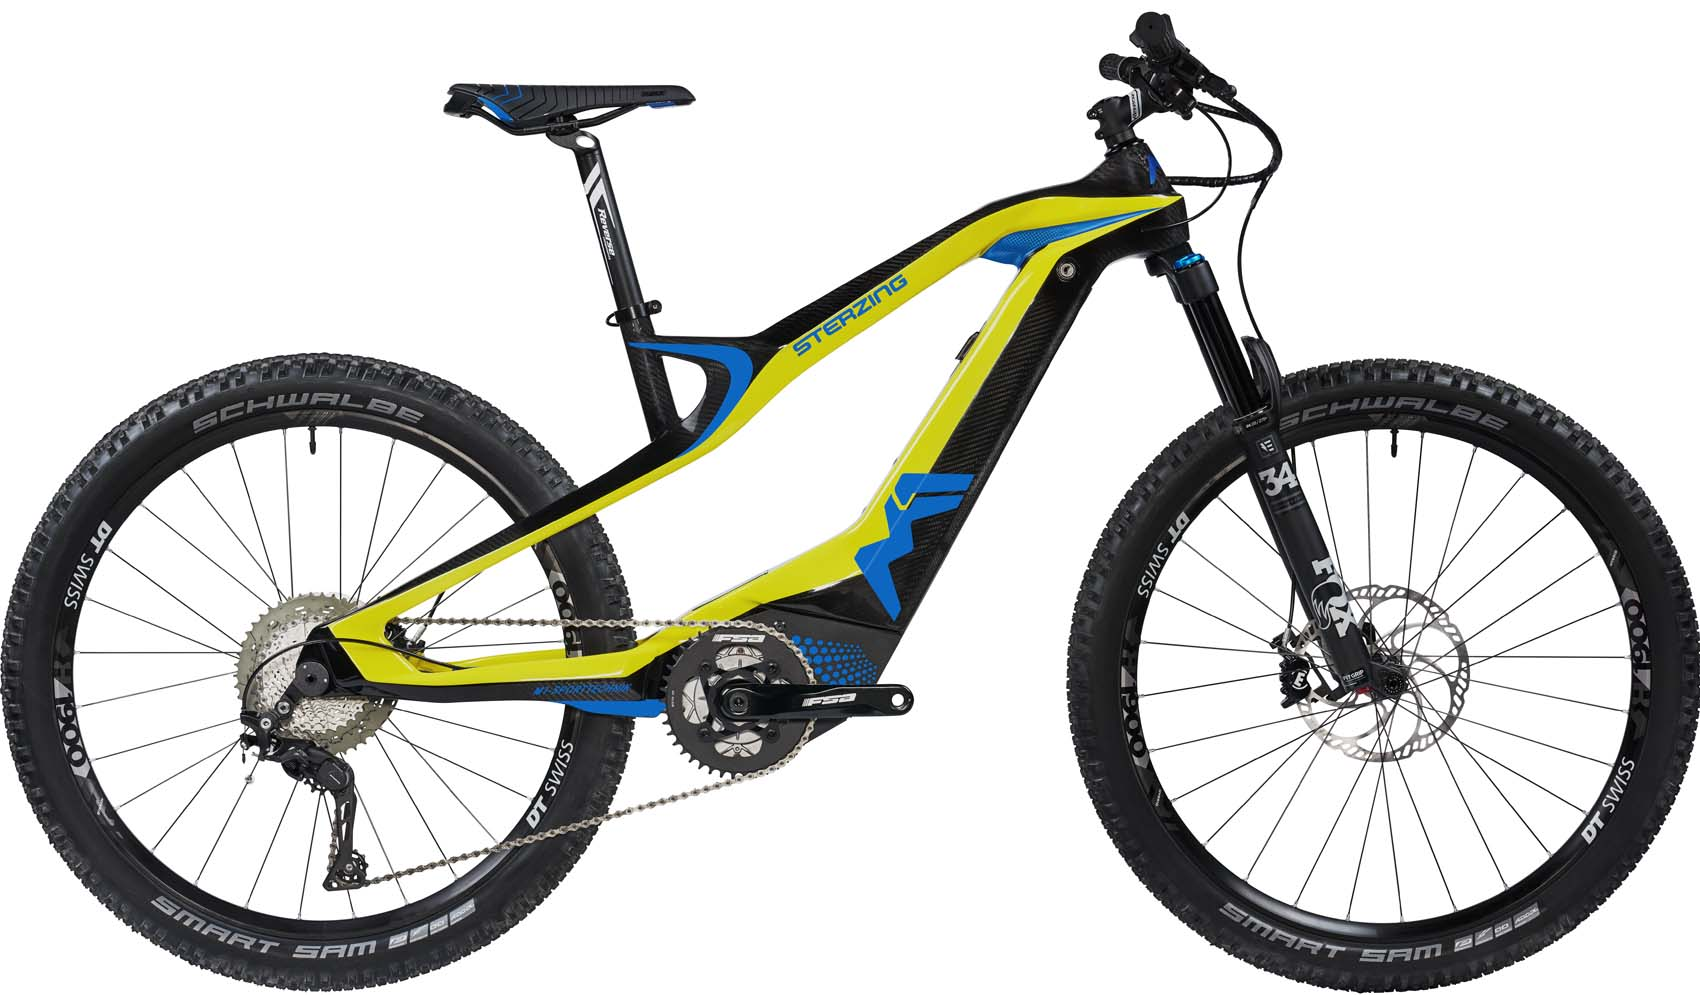 M1 Sterzing Evolution Pedelec 2020 - limoncello yellow, carbon